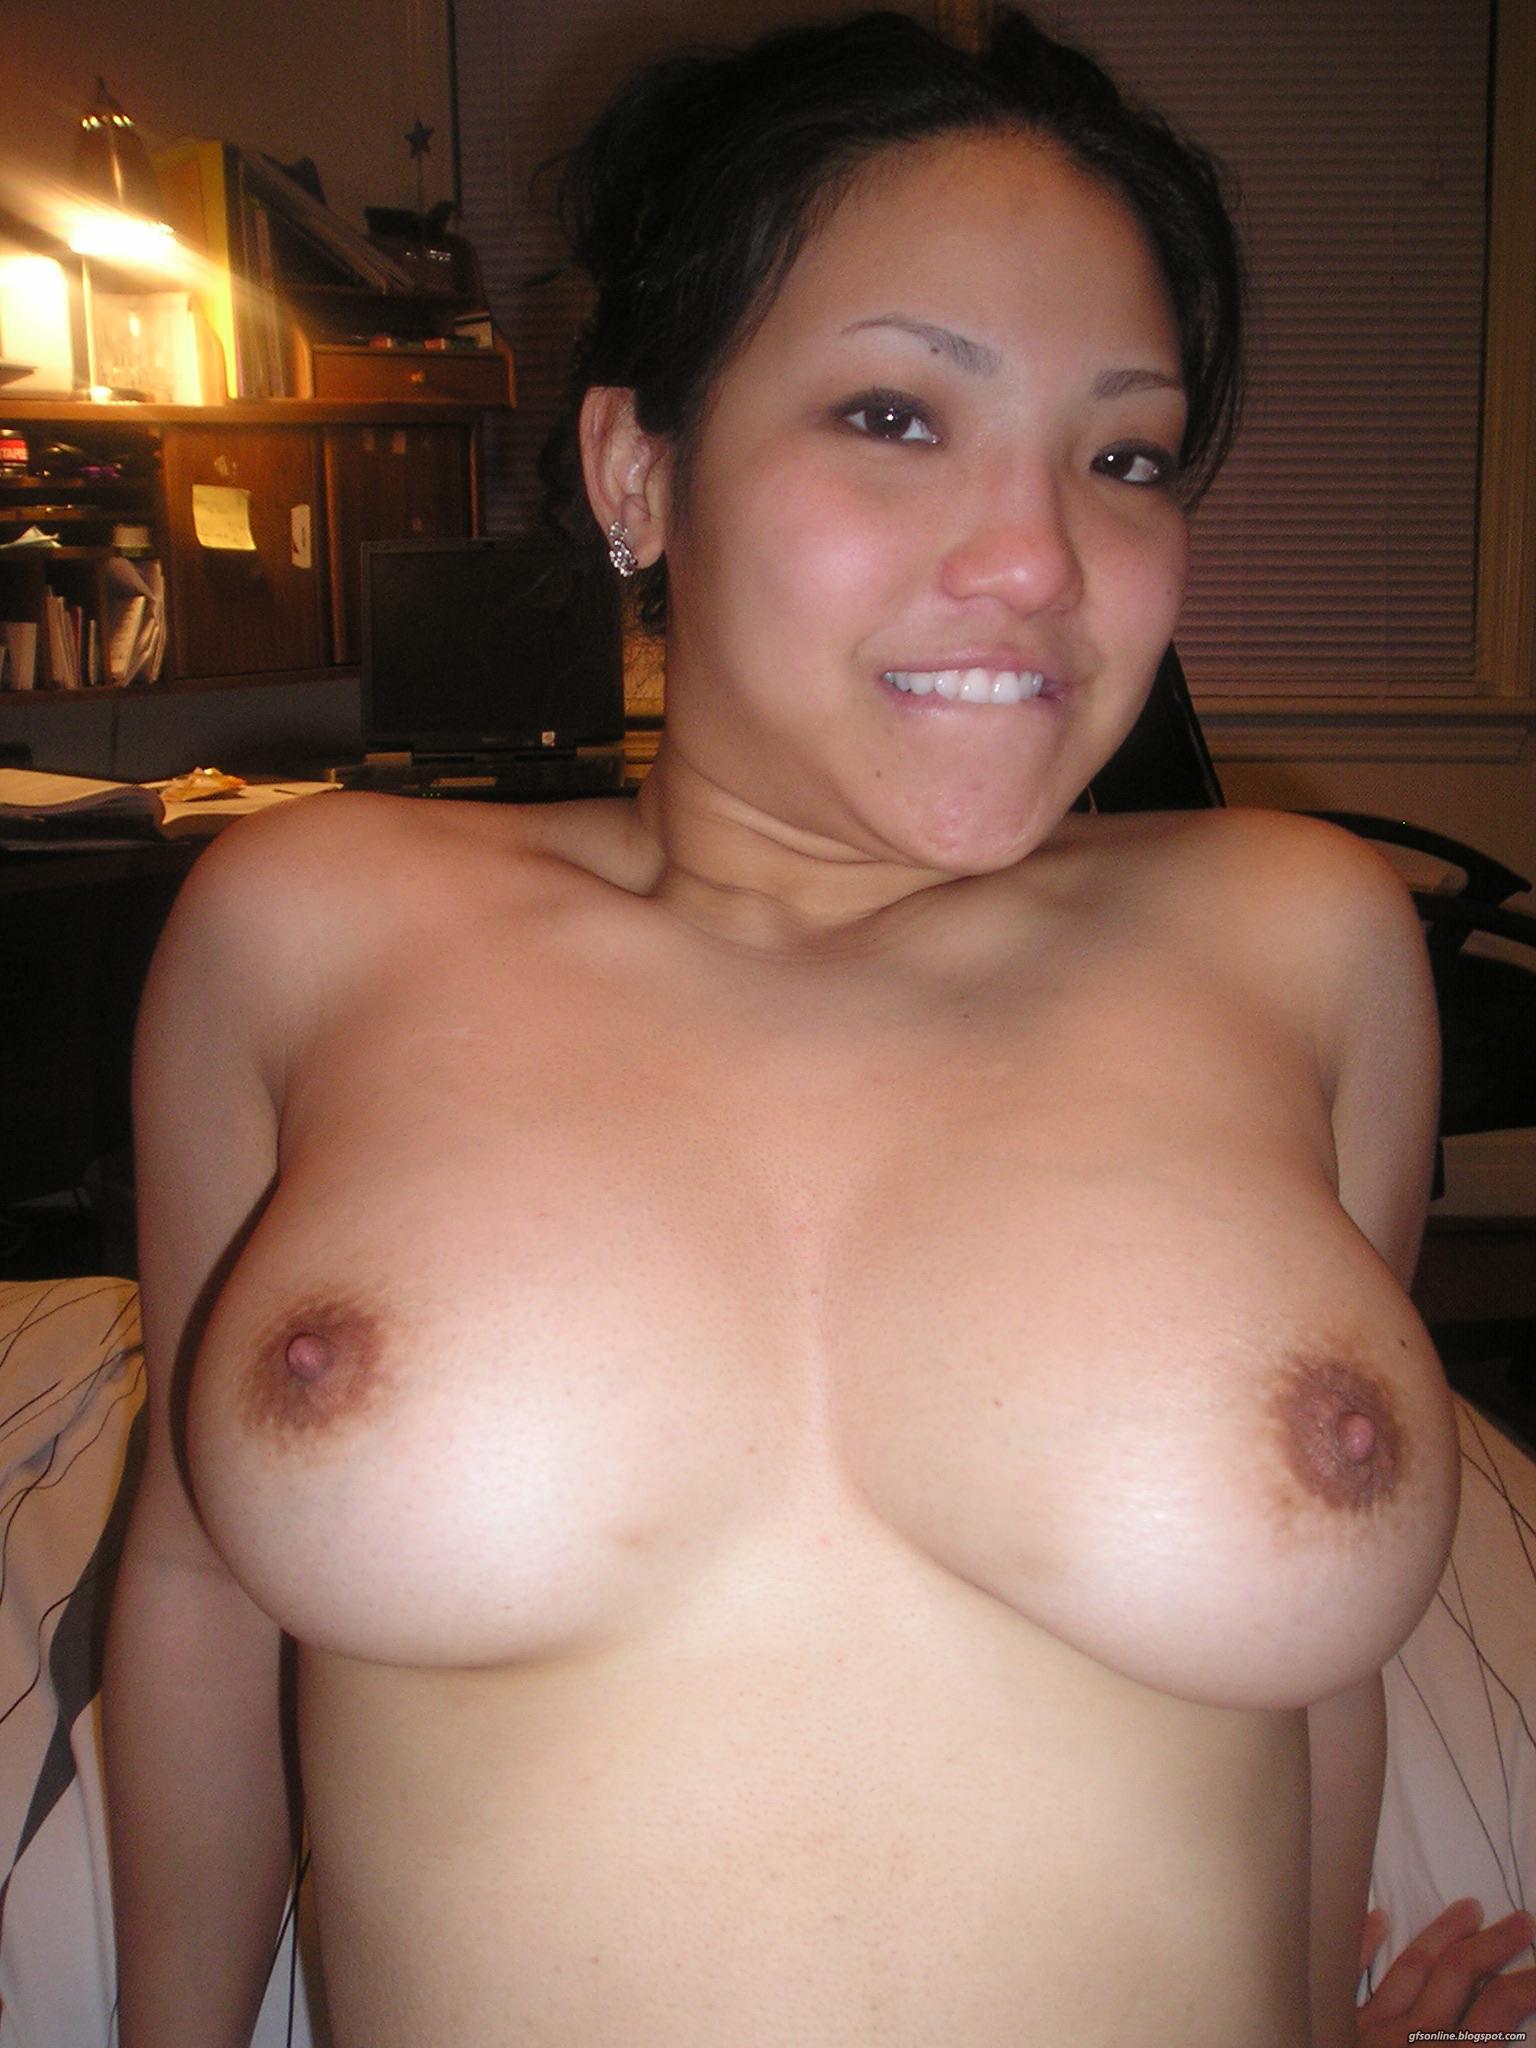 Naughty asian amateurs nude